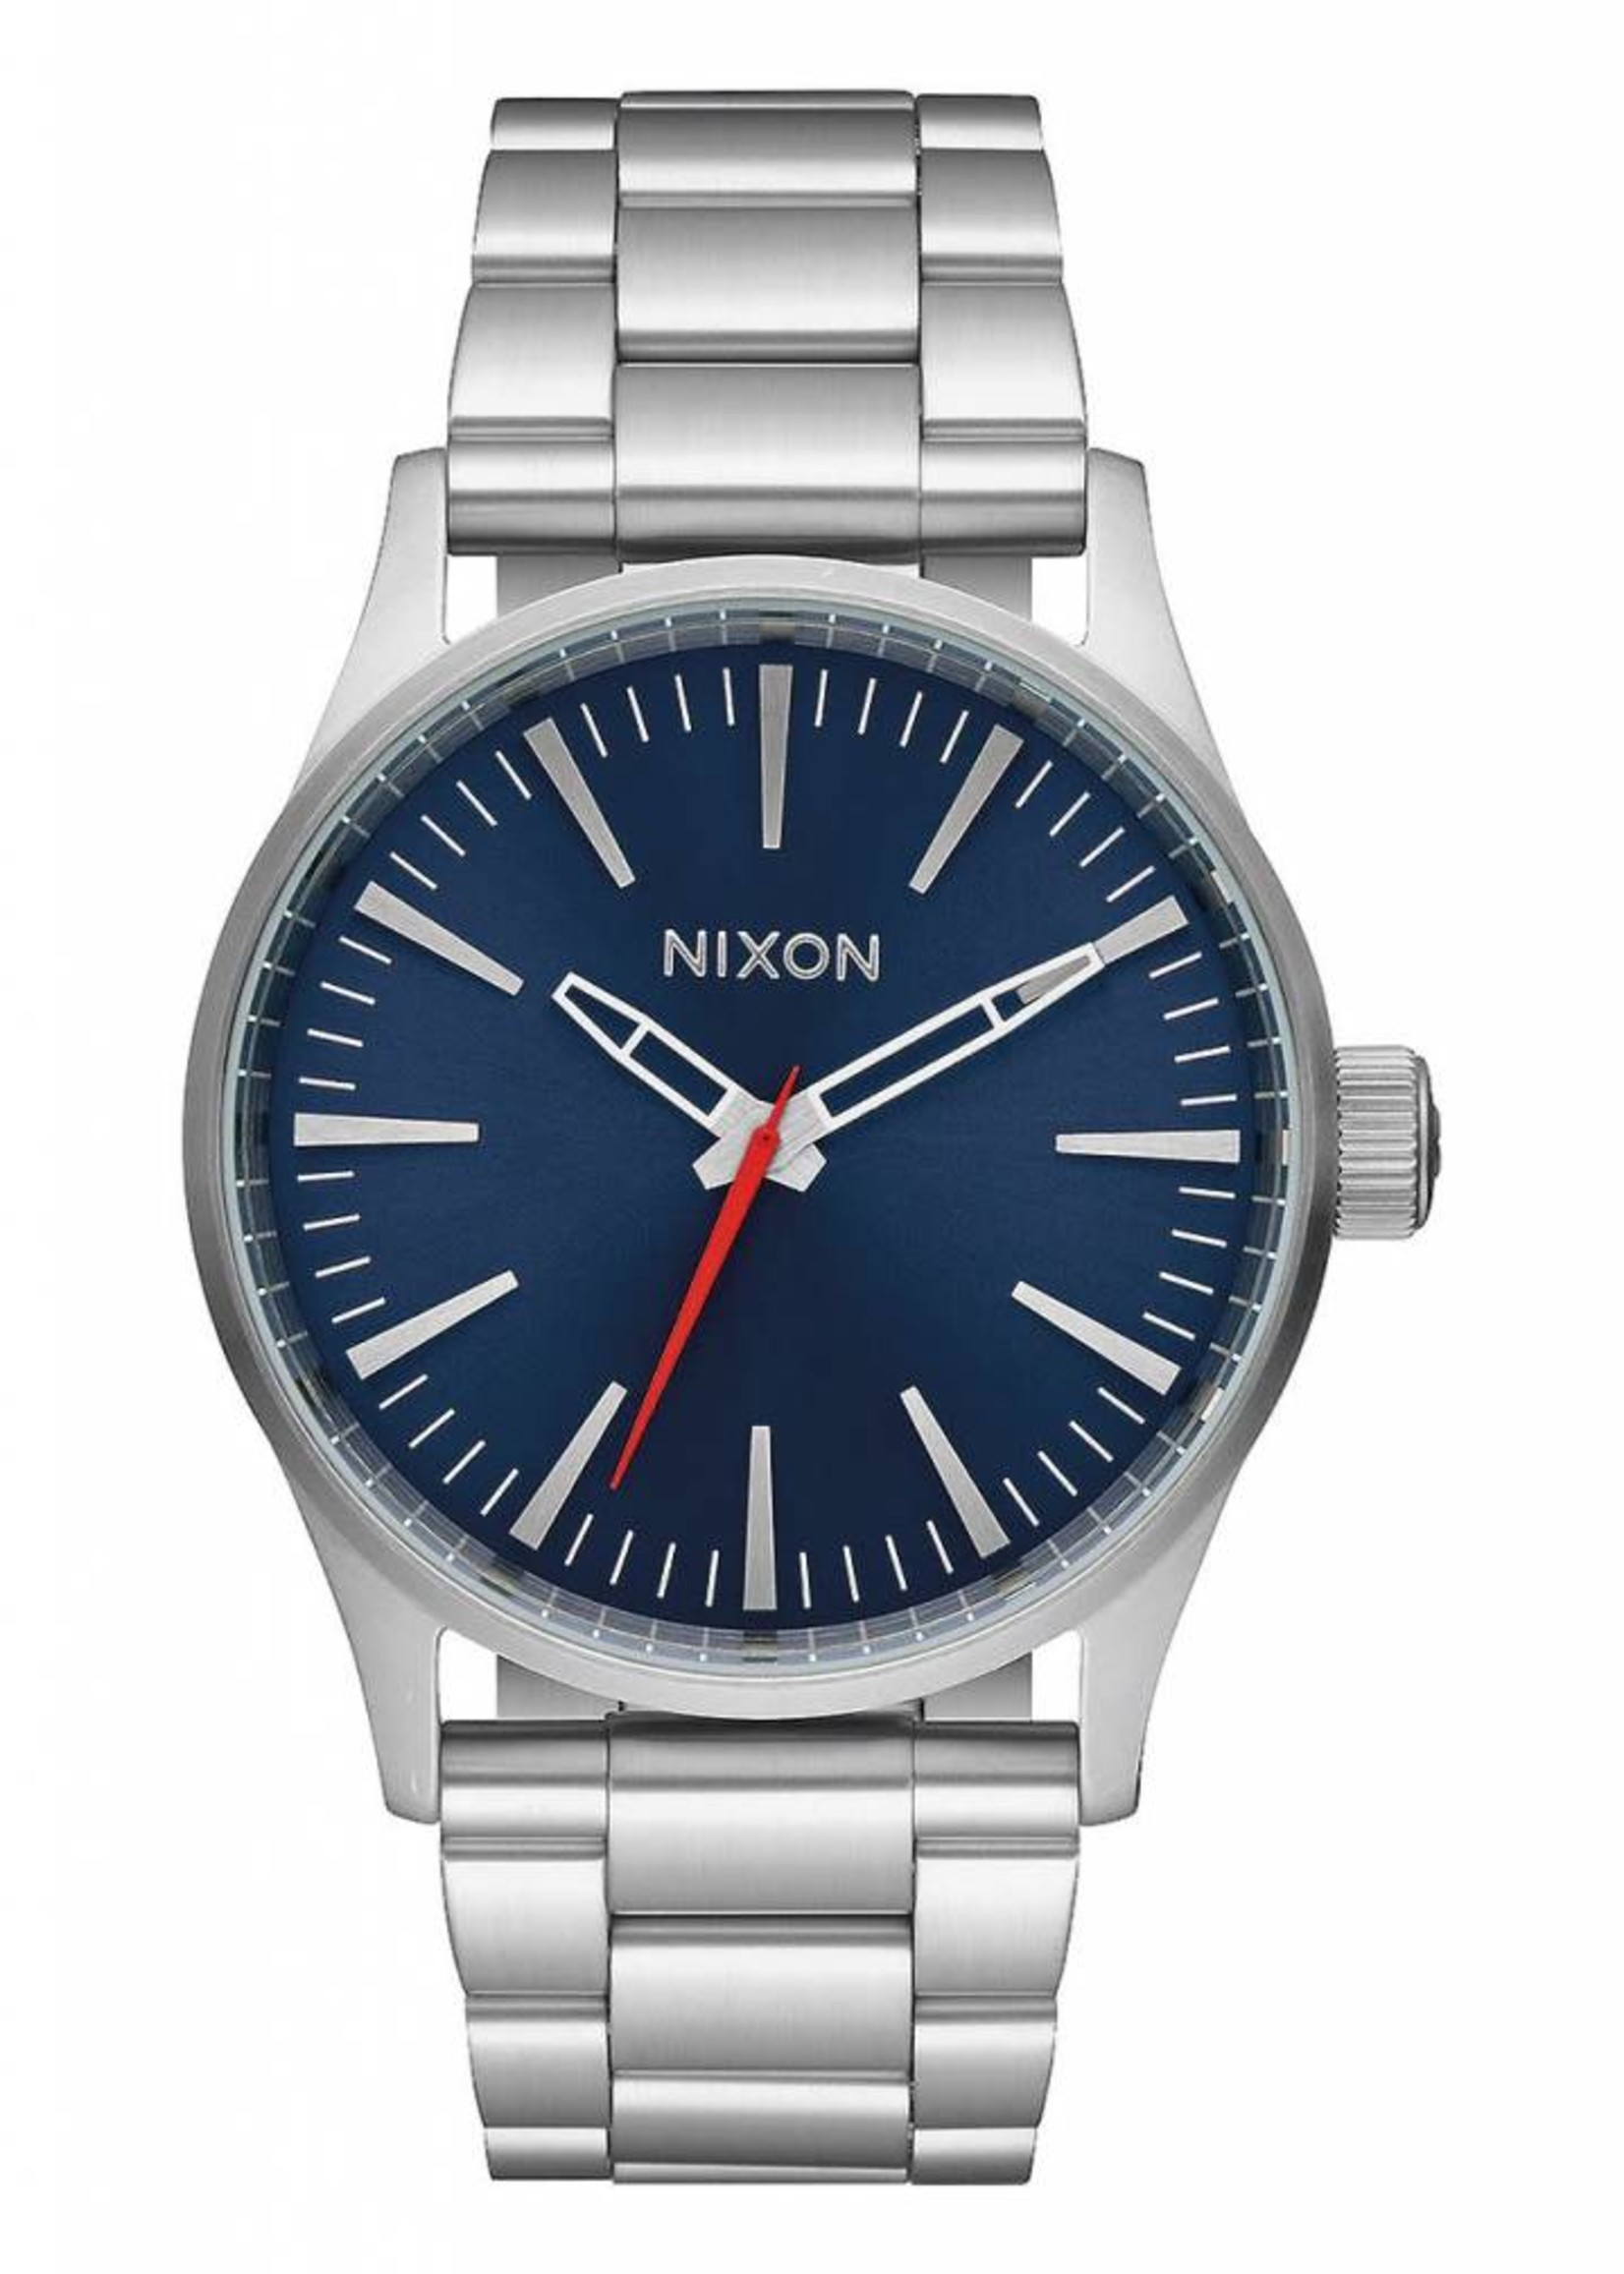 NIXON Sentry Watch,  38 SS, blue sunray